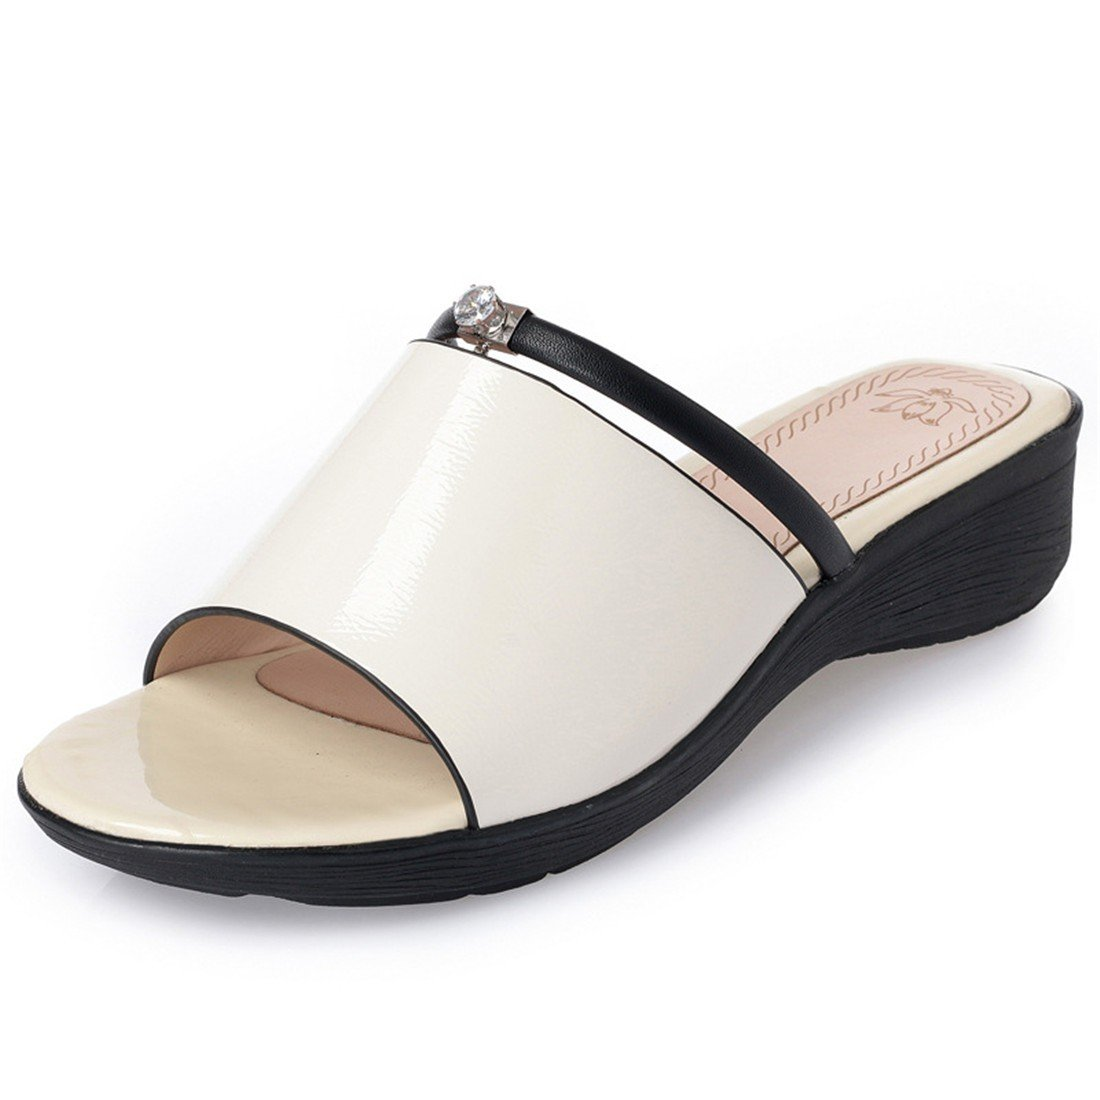 Damas Sandalias, Fondo Grueso Zapatillas, Gran Mollete Zapatos, Zapatos de Playa,Blanco,Treinta y Siete US6.5-7 / EU37 / UK4.5-5 / CN37|white